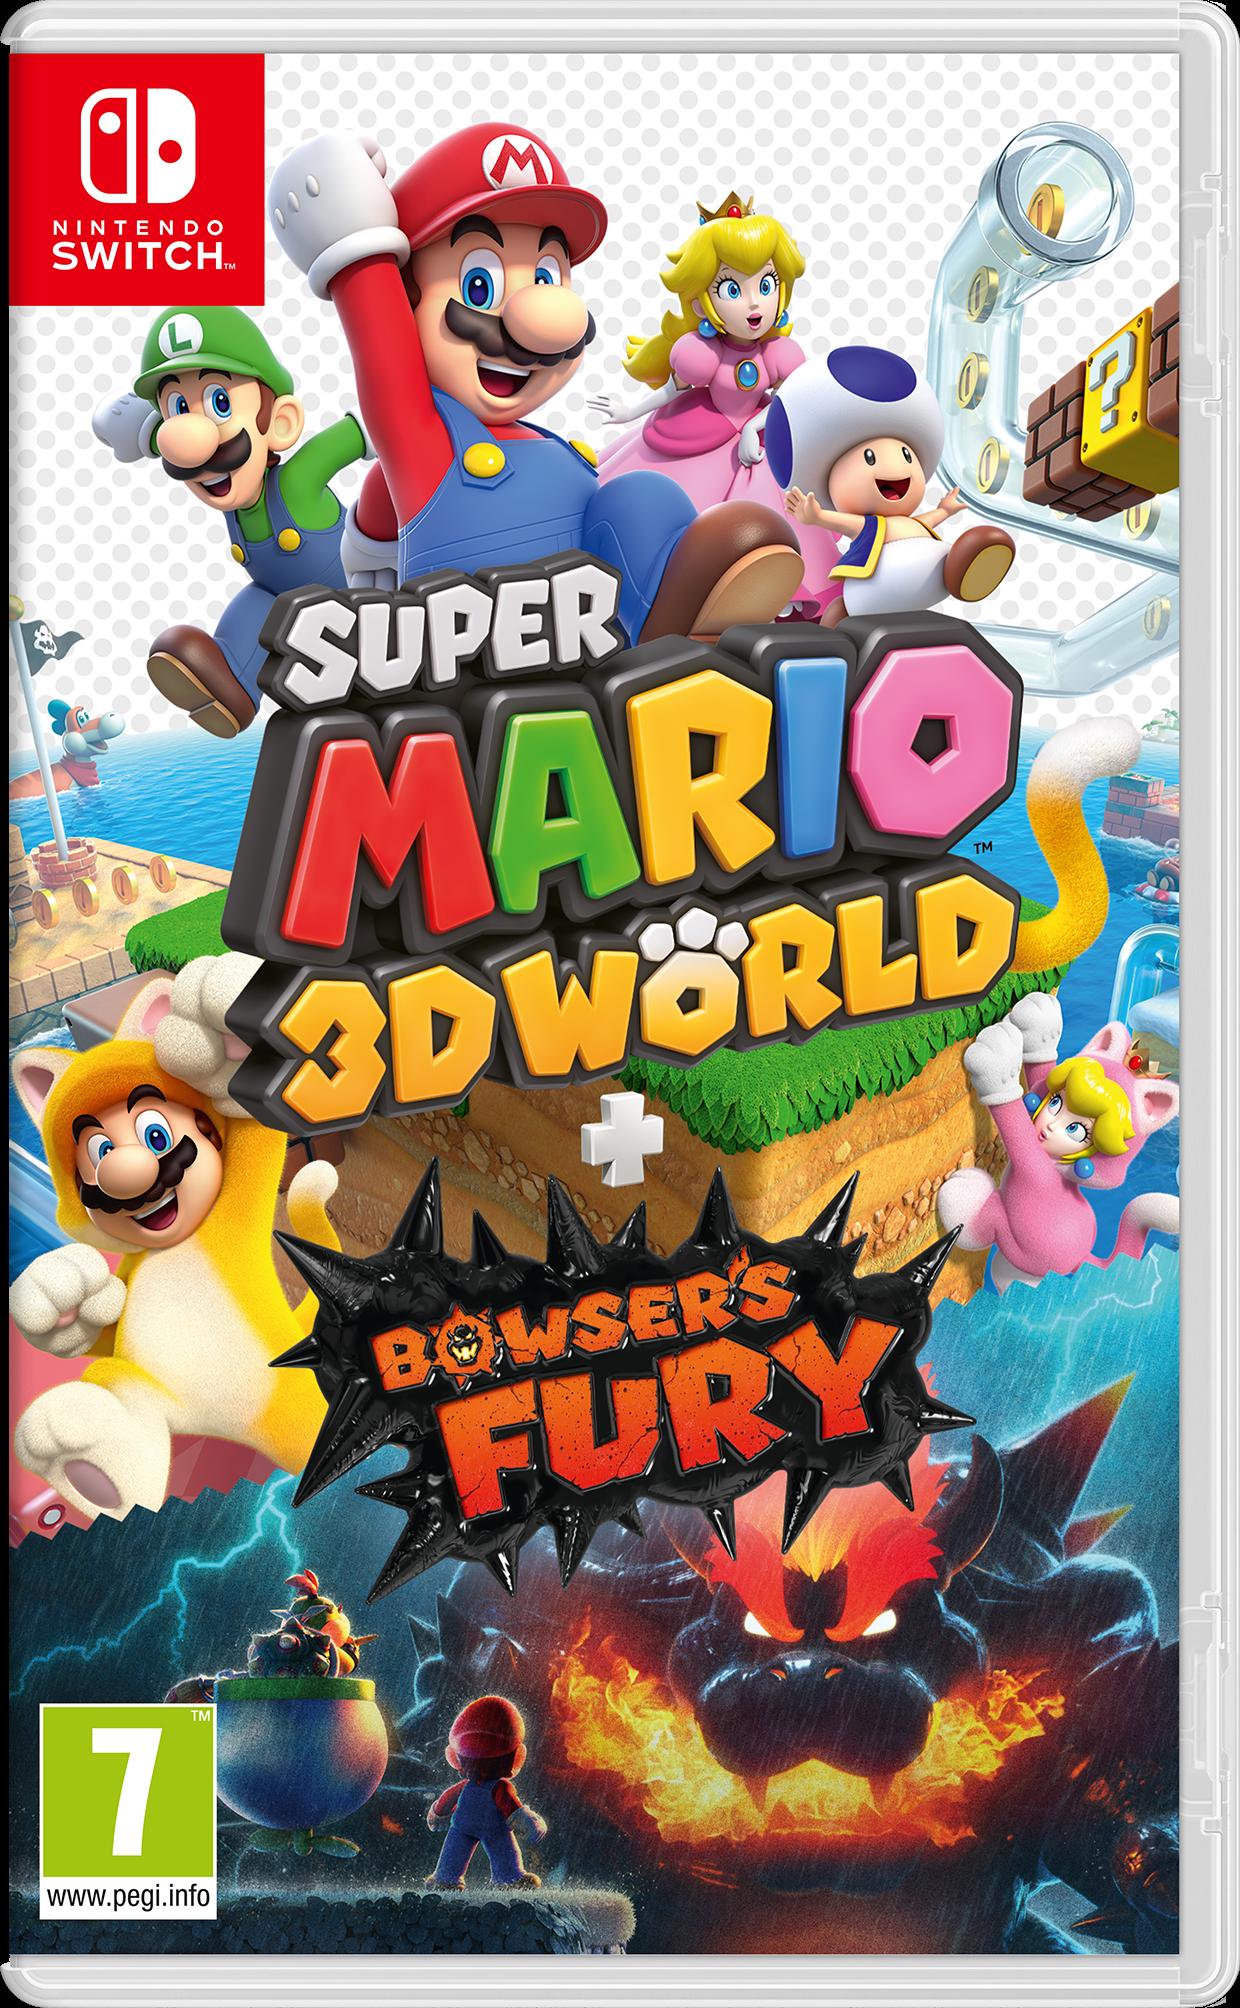 Super Mario 3D World + Bowser's Fury (UK, SE, DK, FI)